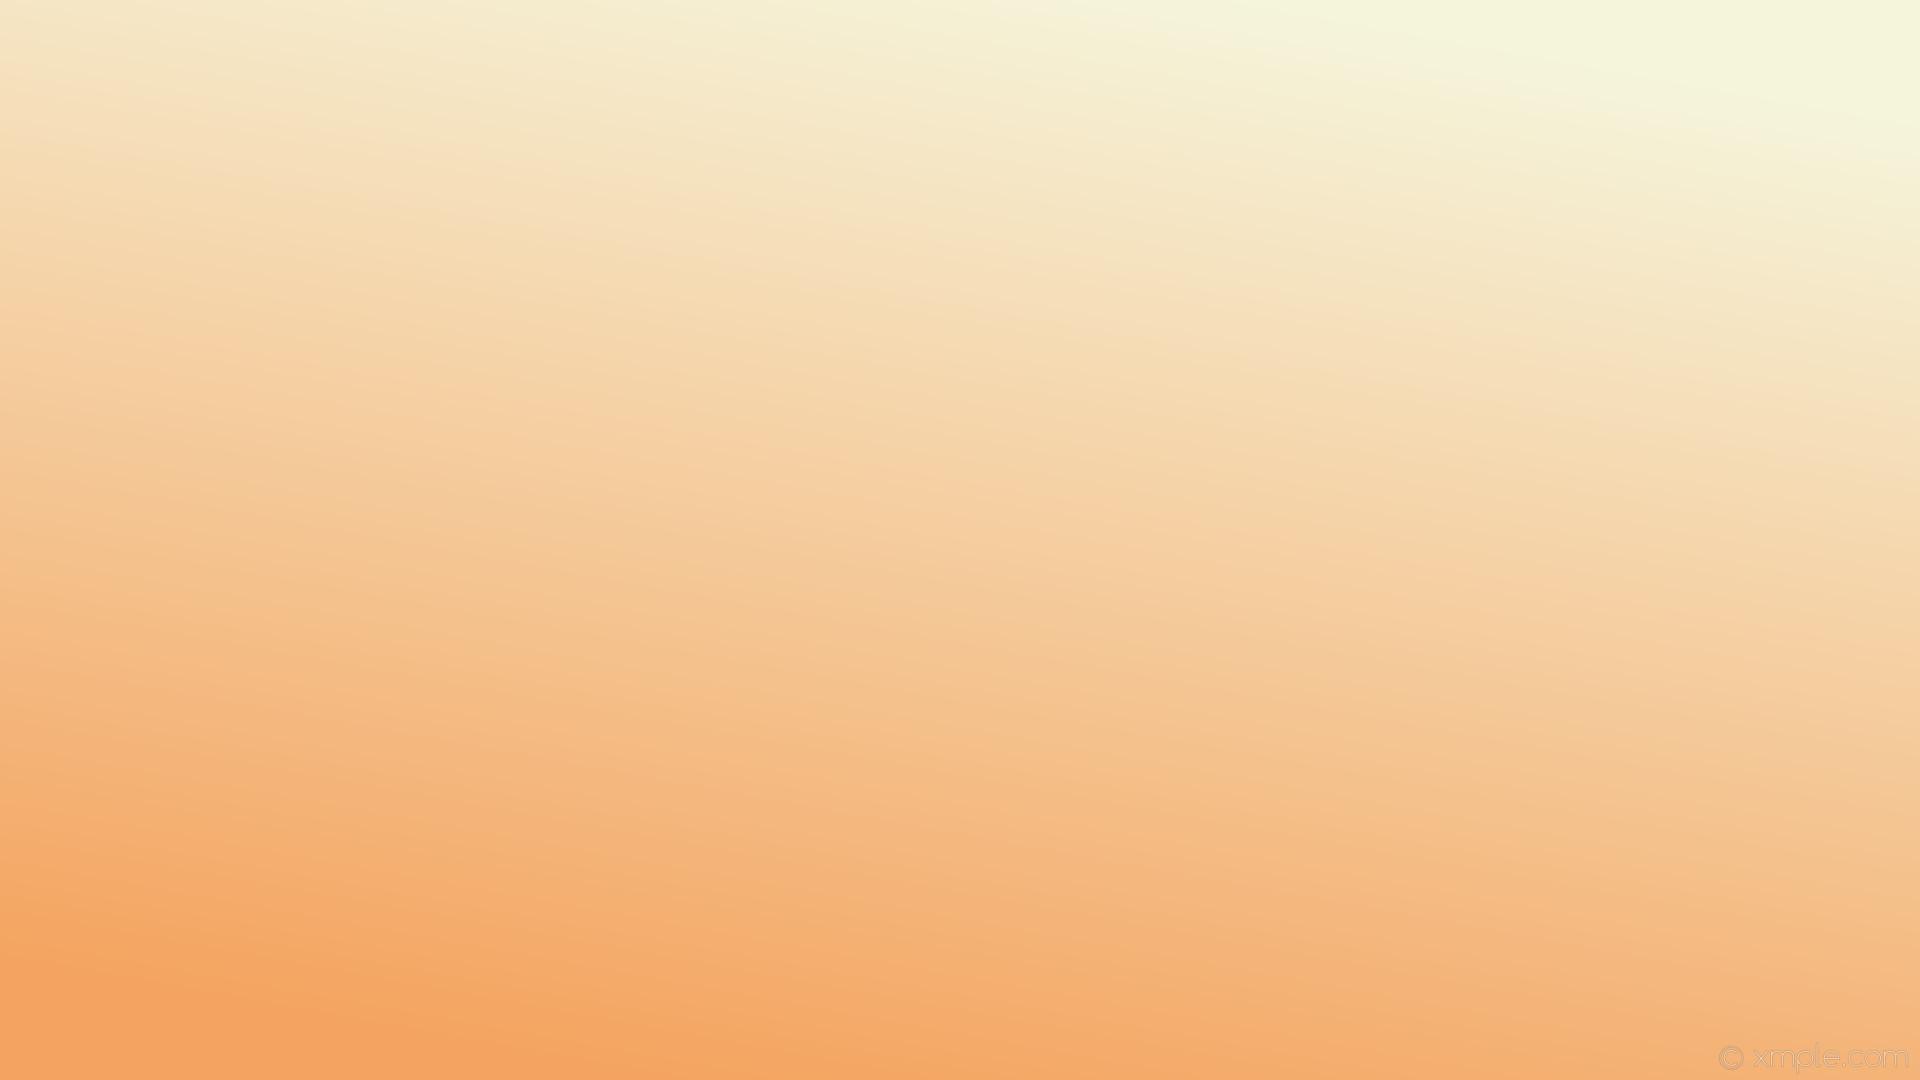 wallpaper linear brown white gradient sandy brown beige #f4a460 #f5f5dc 240°